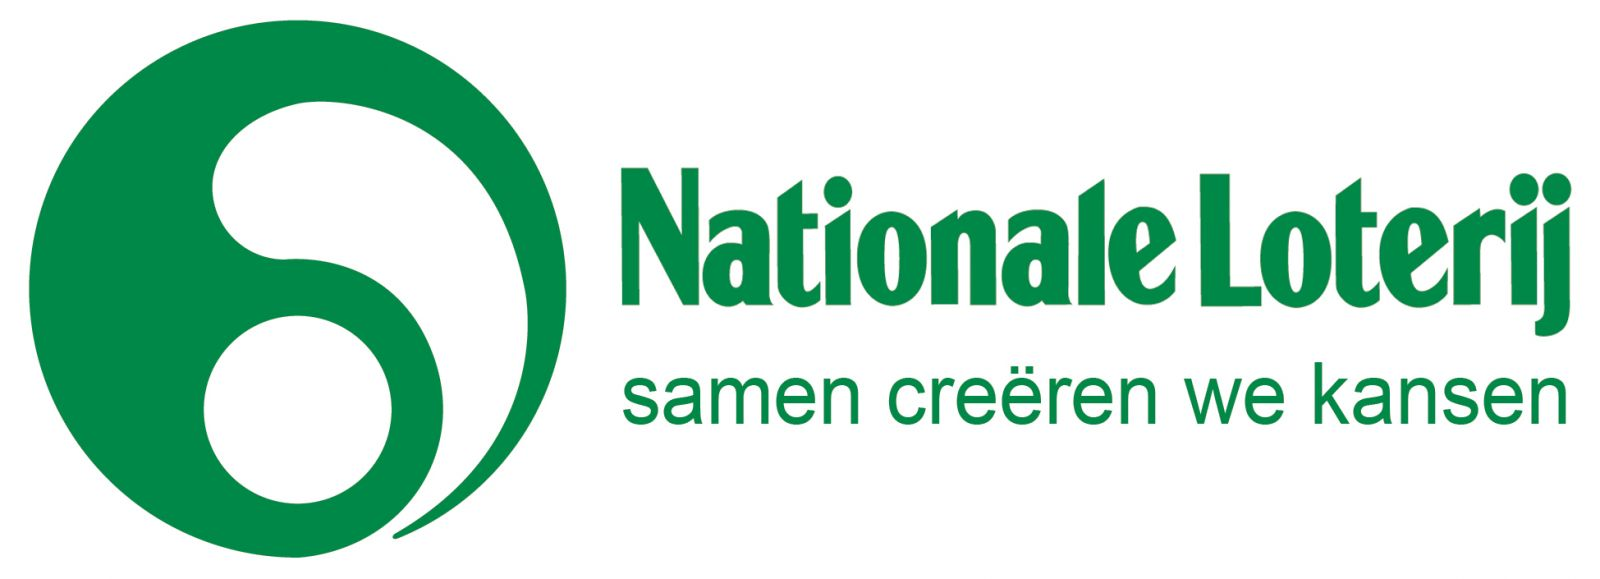 https://www.buitenlandseloterijen.com/wp-content/uploads/2015/10/logo-Nationale-Loterij.jpg